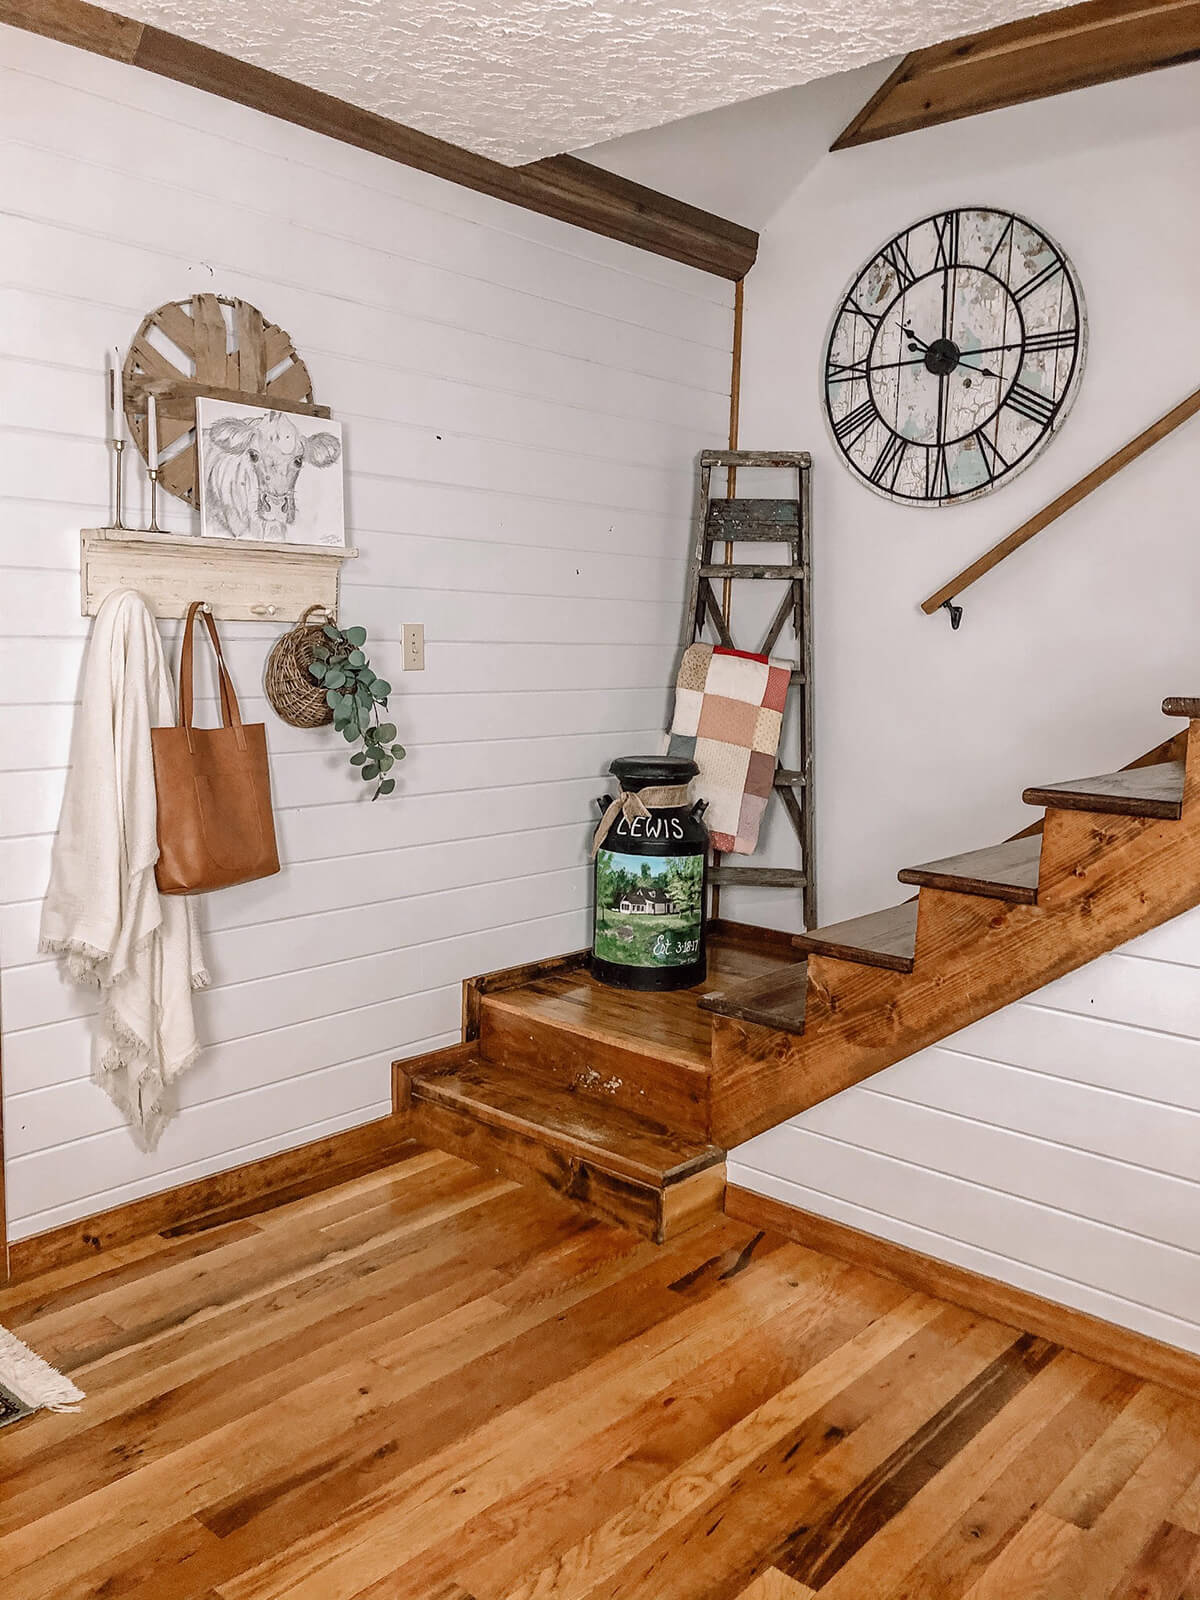 Rustic Farmhouse Country Home Decor